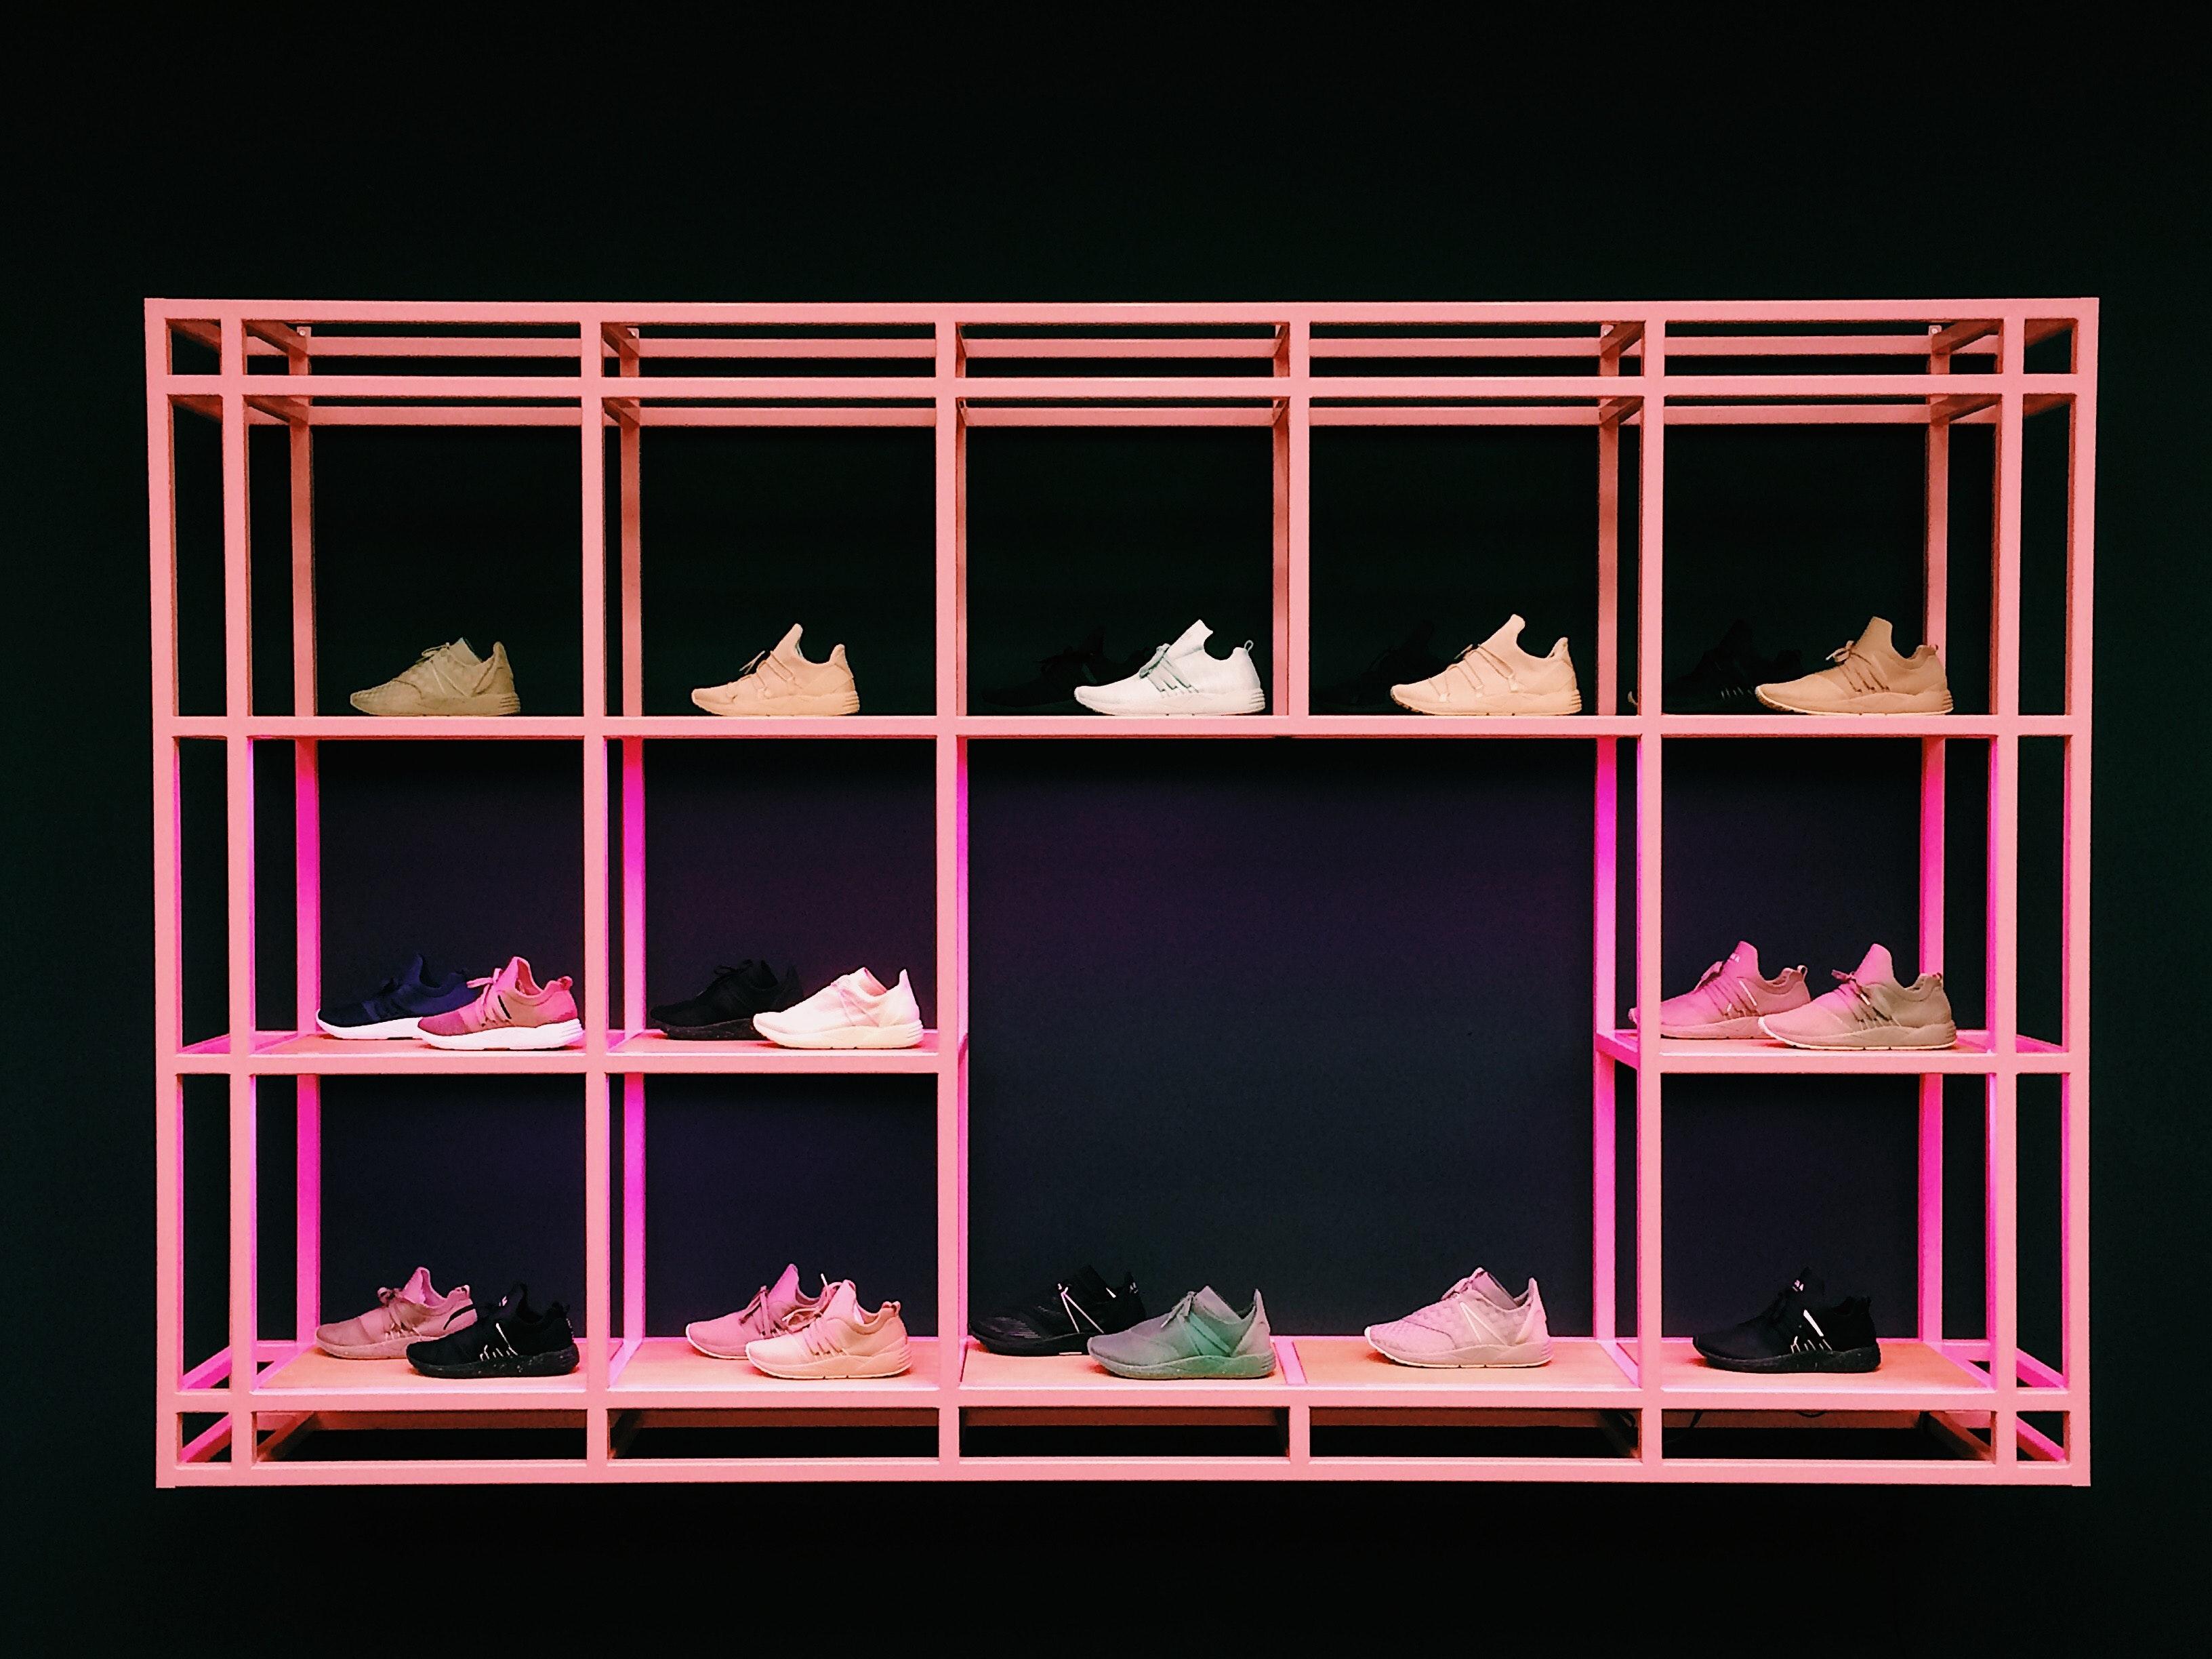 Gambar : berwarna merah muda, mebel, papan untuk rak, kamar 3264x2448 - robin - 1514629 - Galeri ...